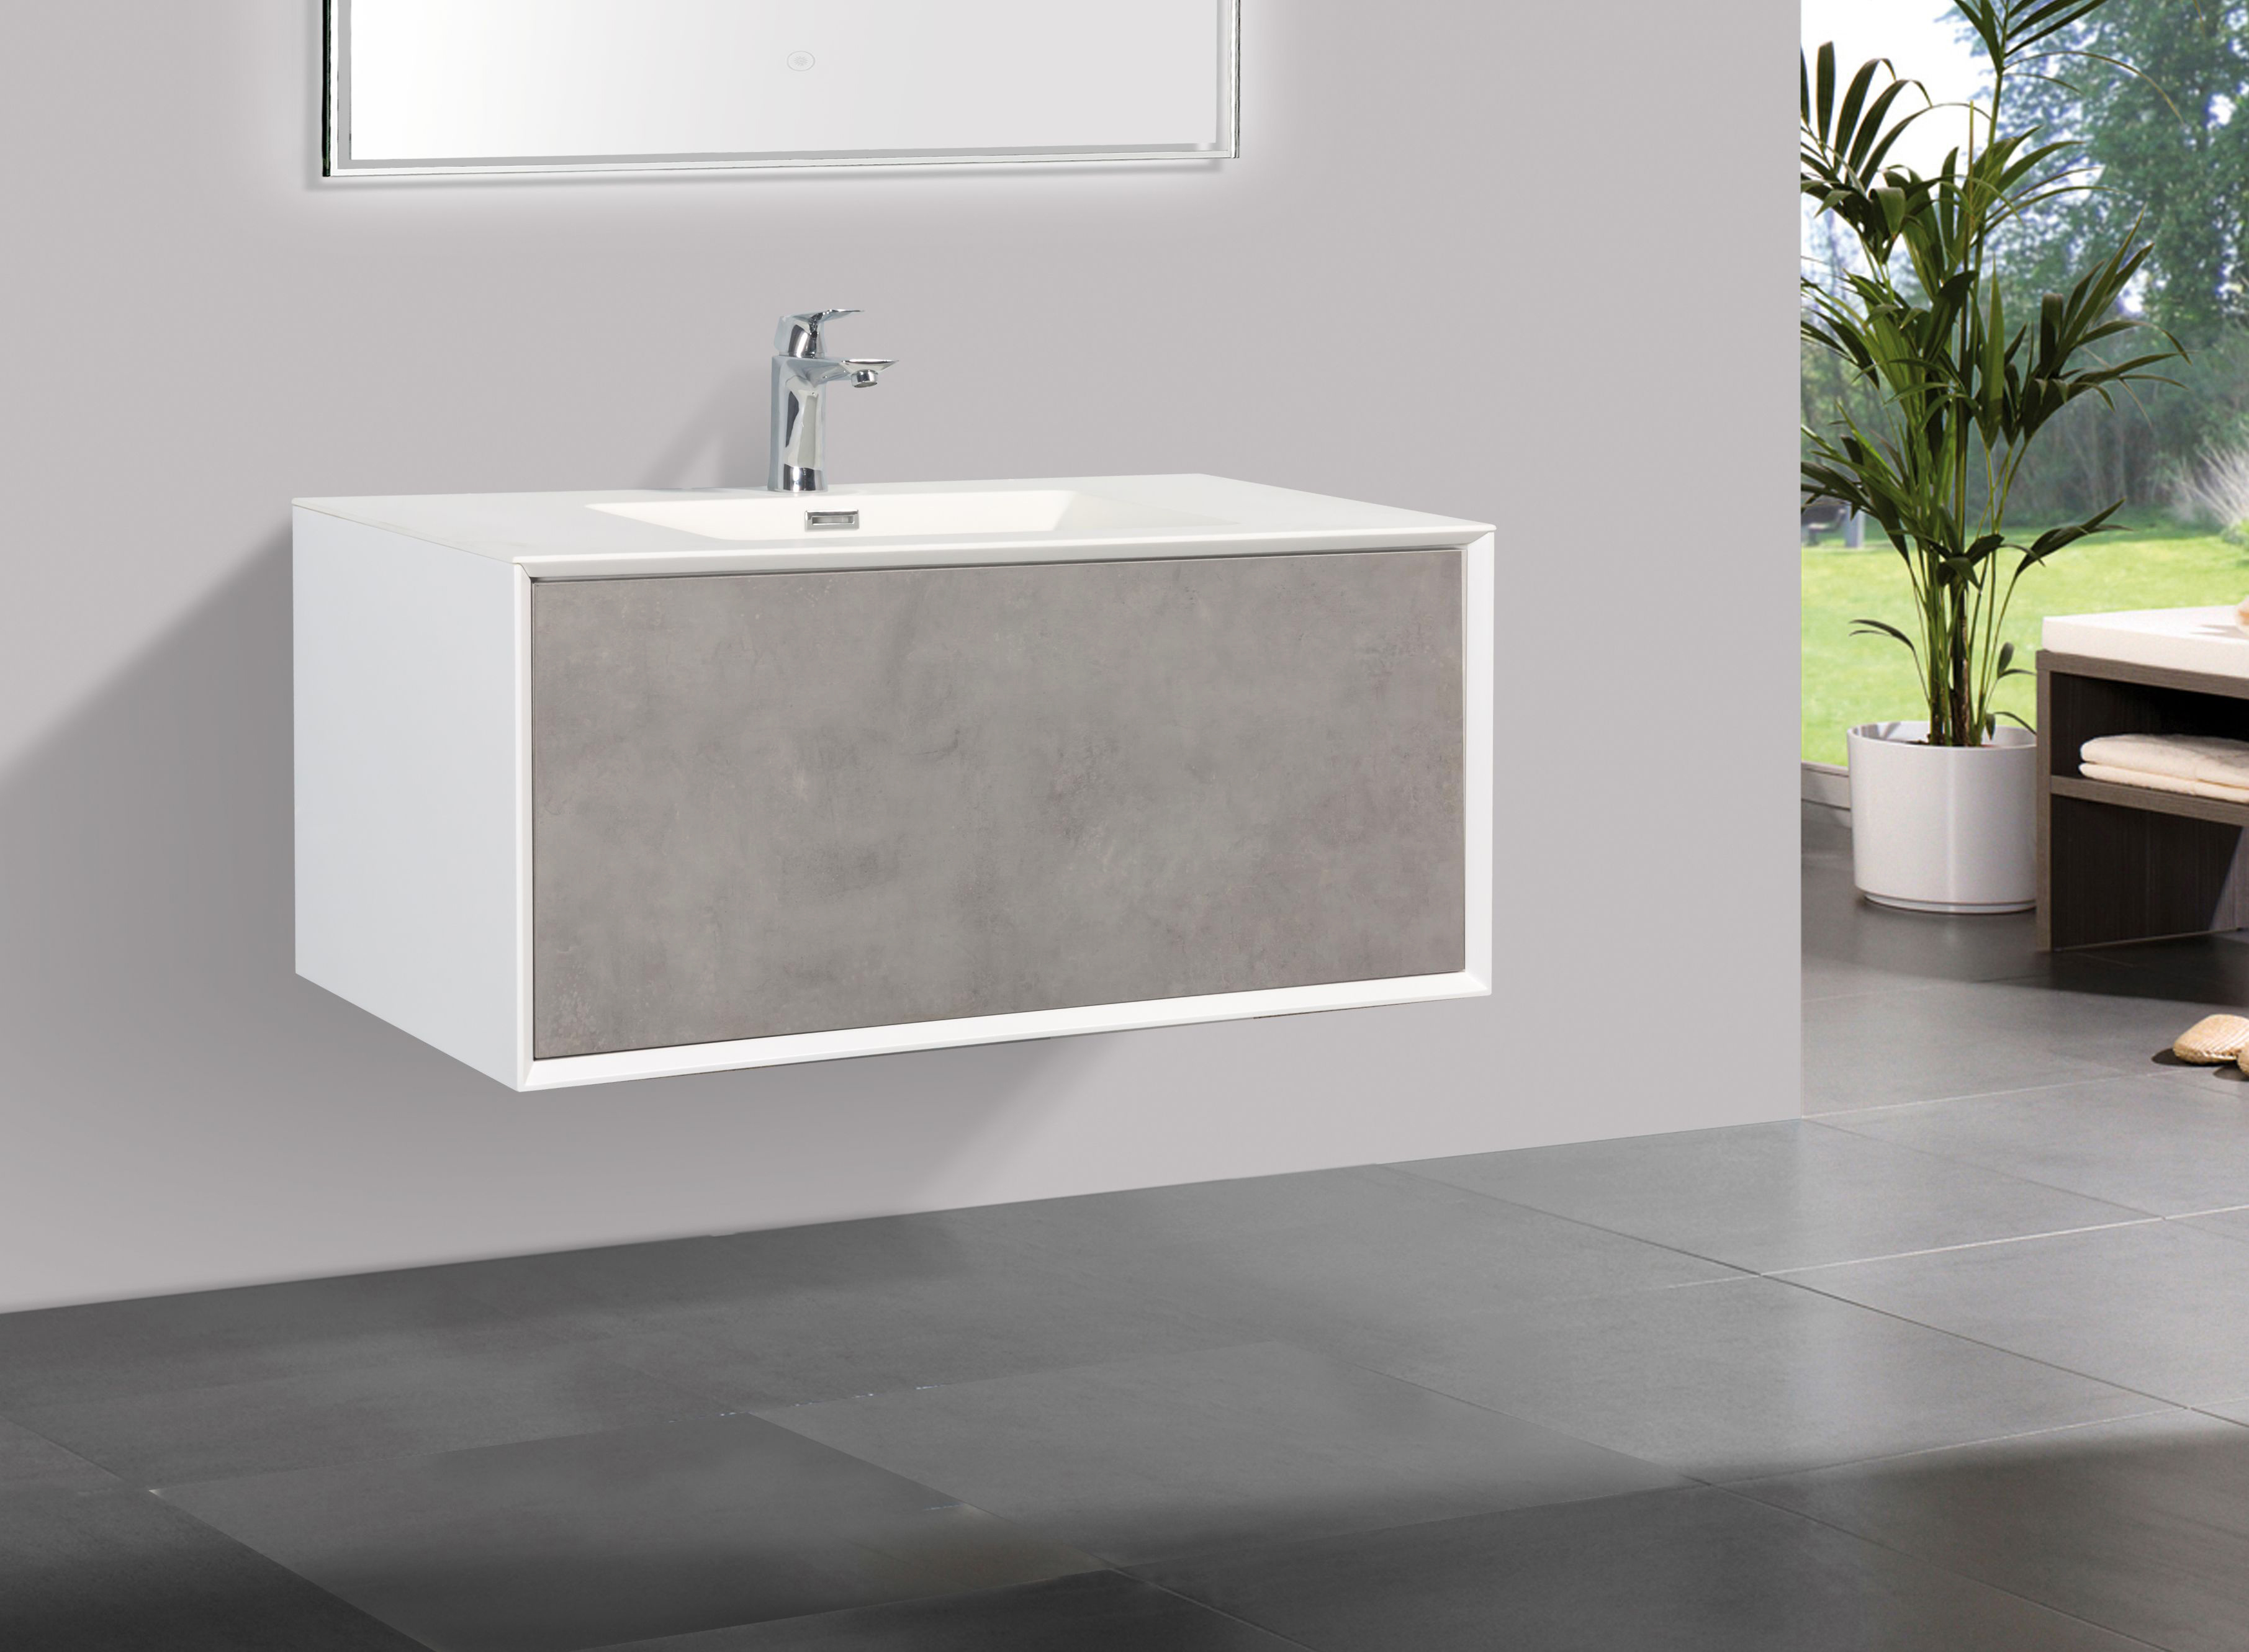 Badmöbel Unterschrank inkl. Waschtisch SELVA 90 (beton)